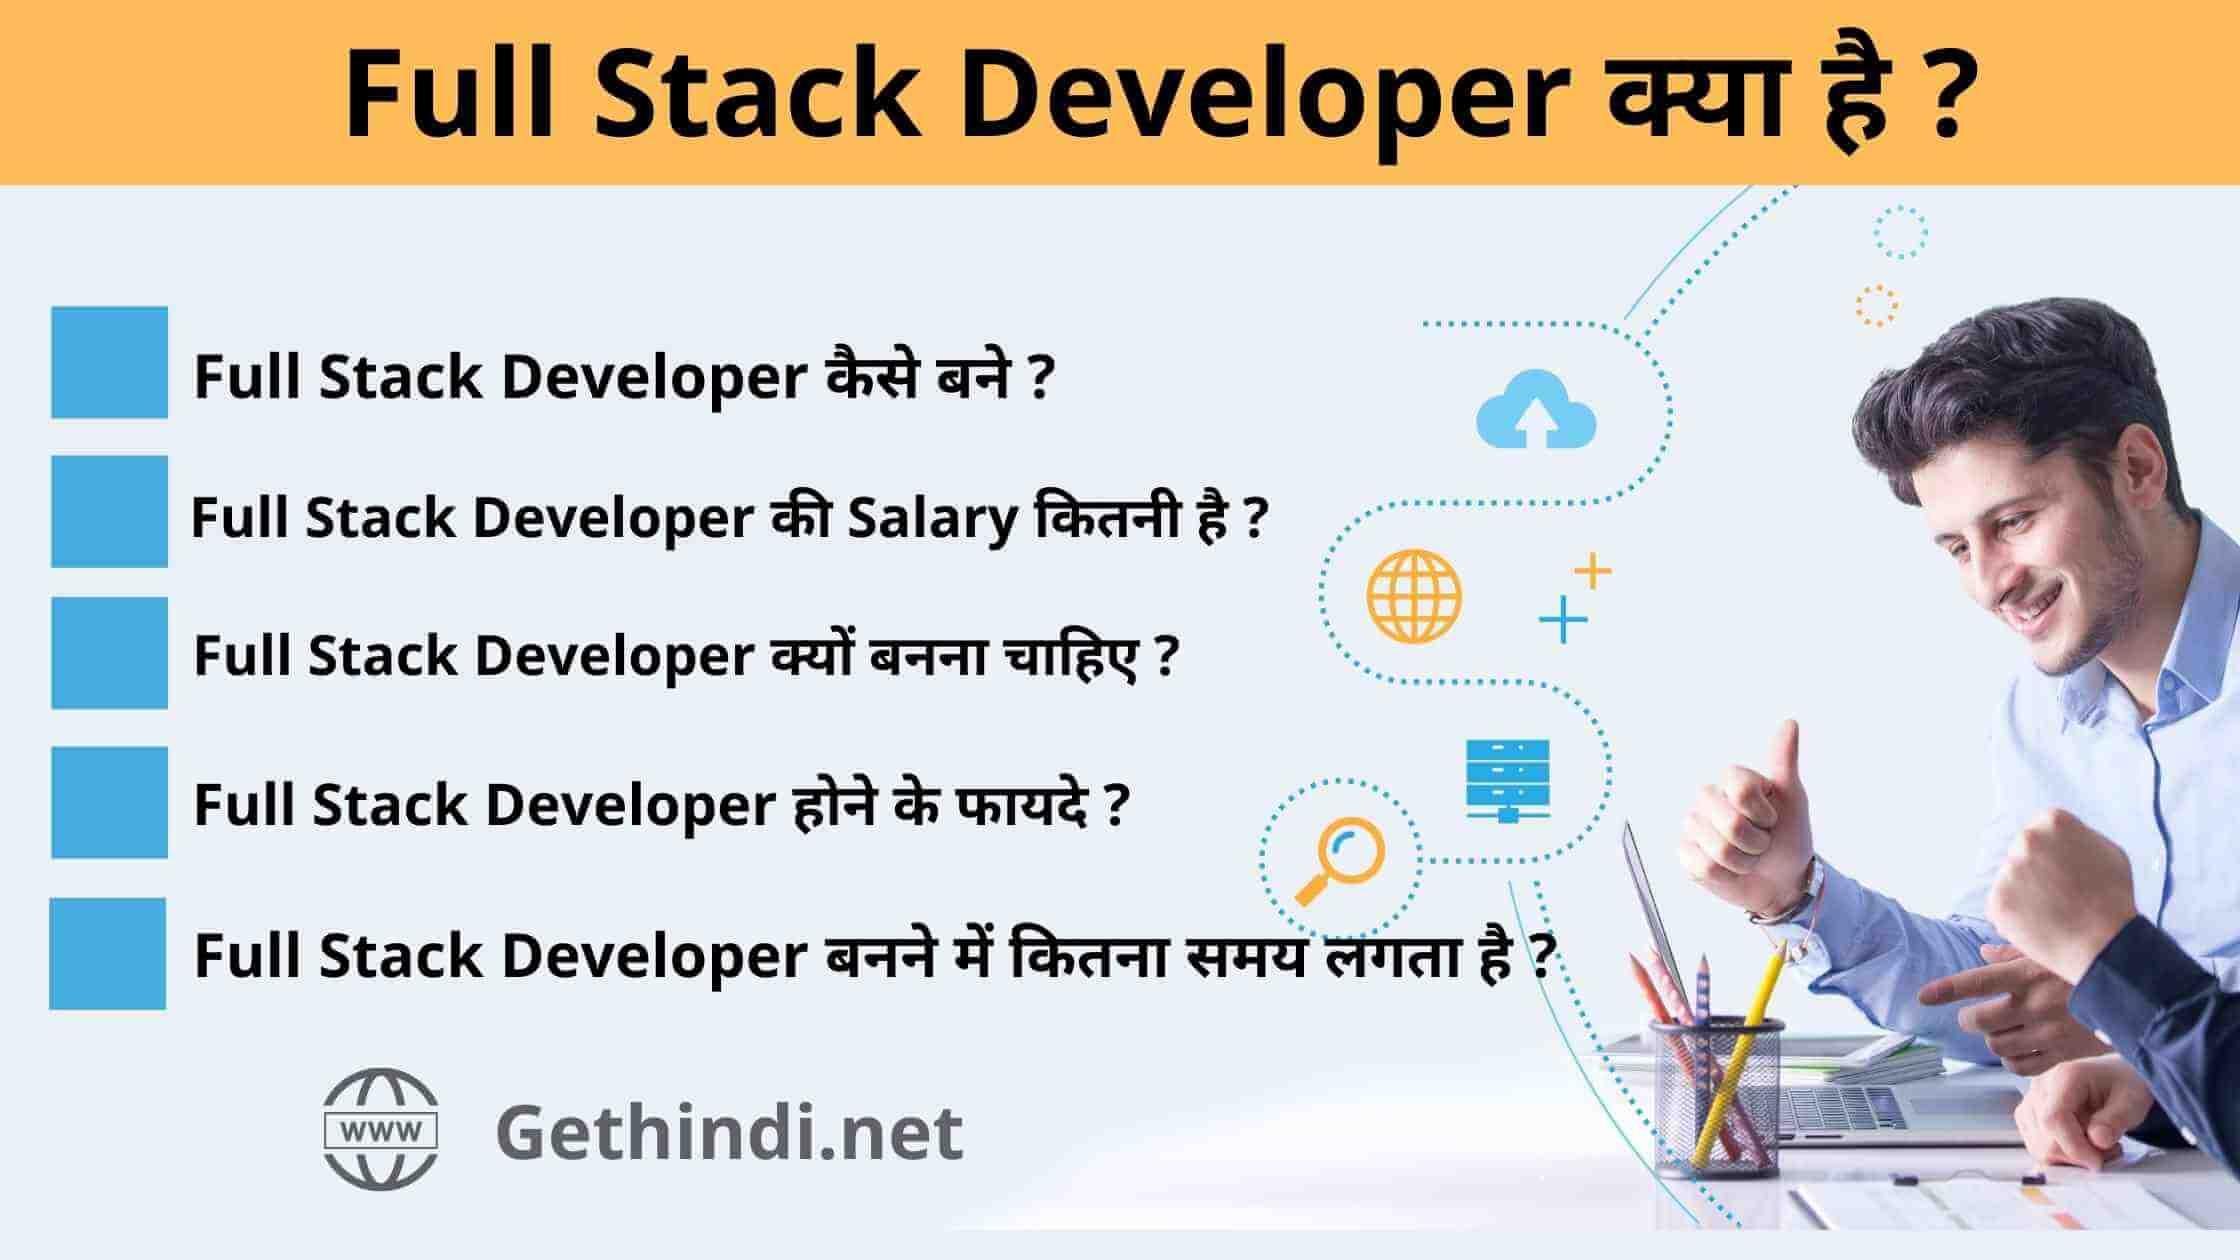 full stack developer meaning in hindi